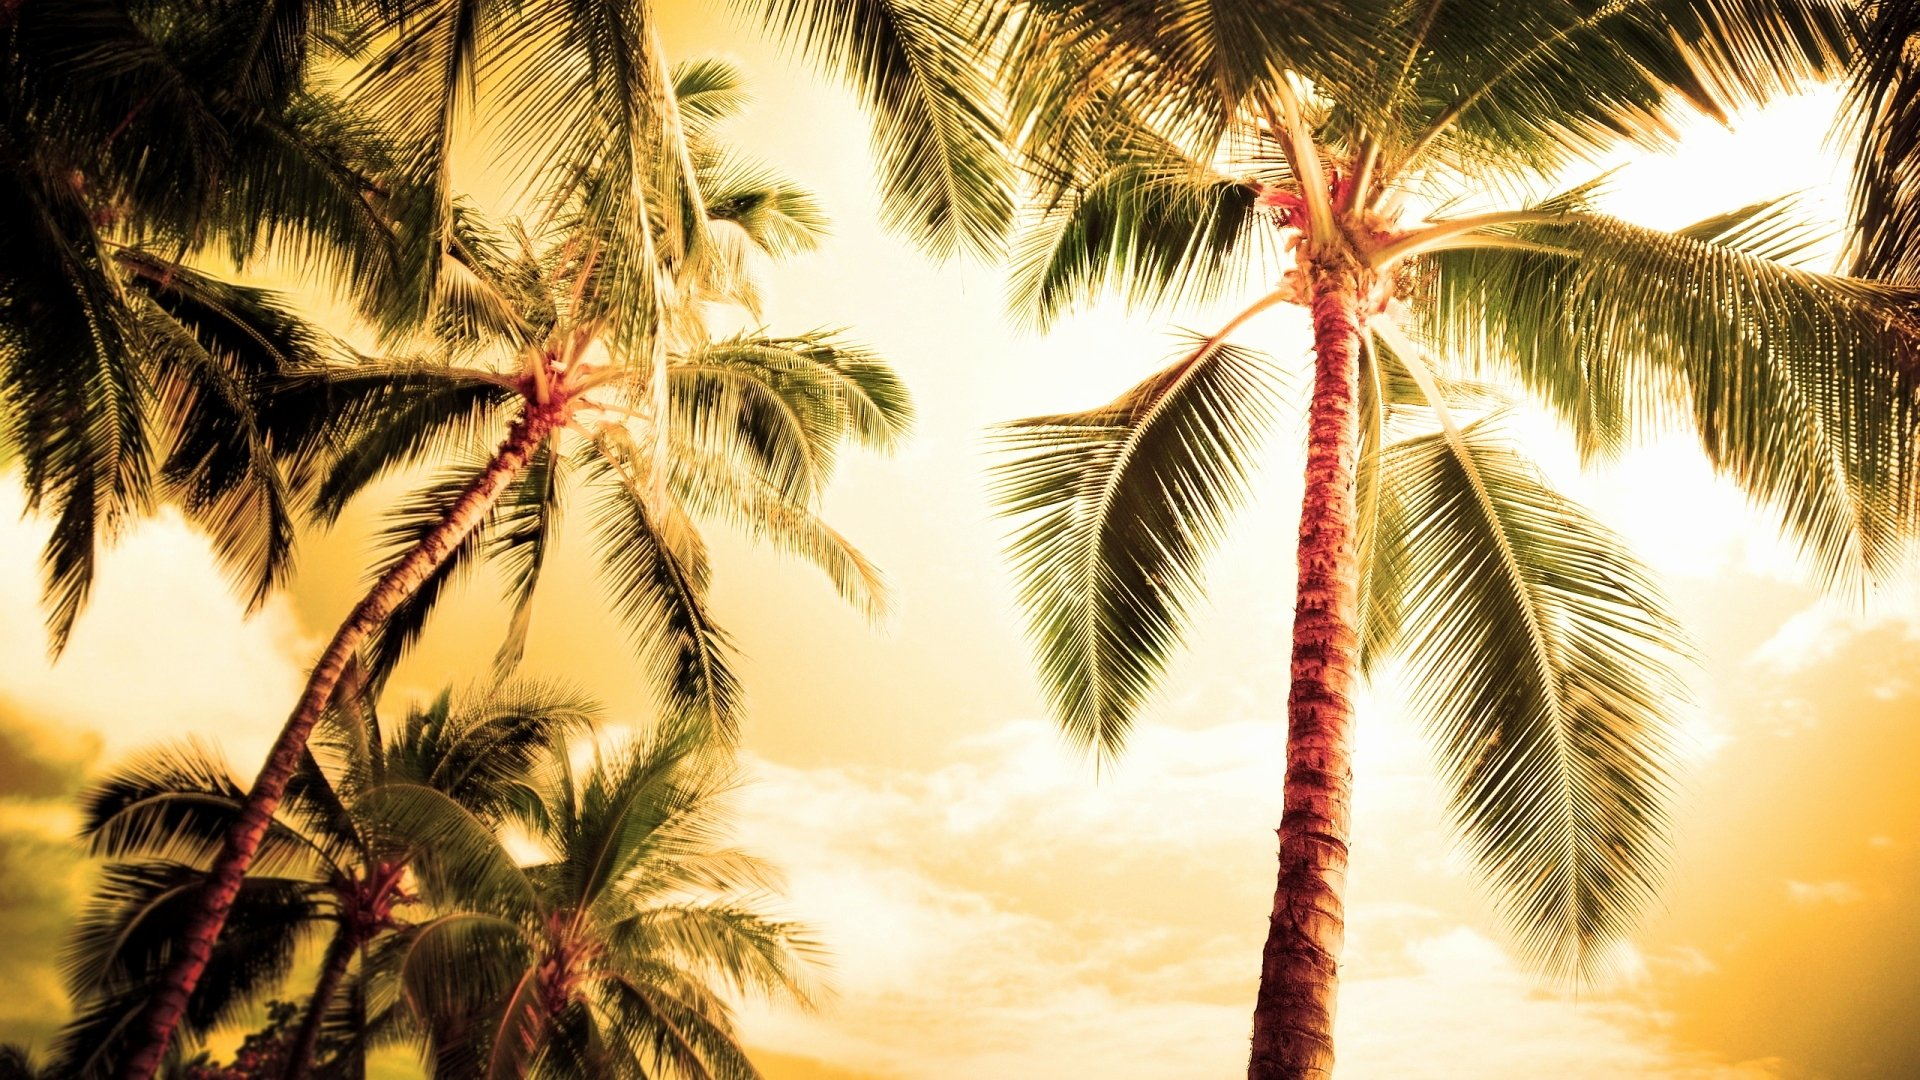 Palm Tree Screensaver wallpaper download